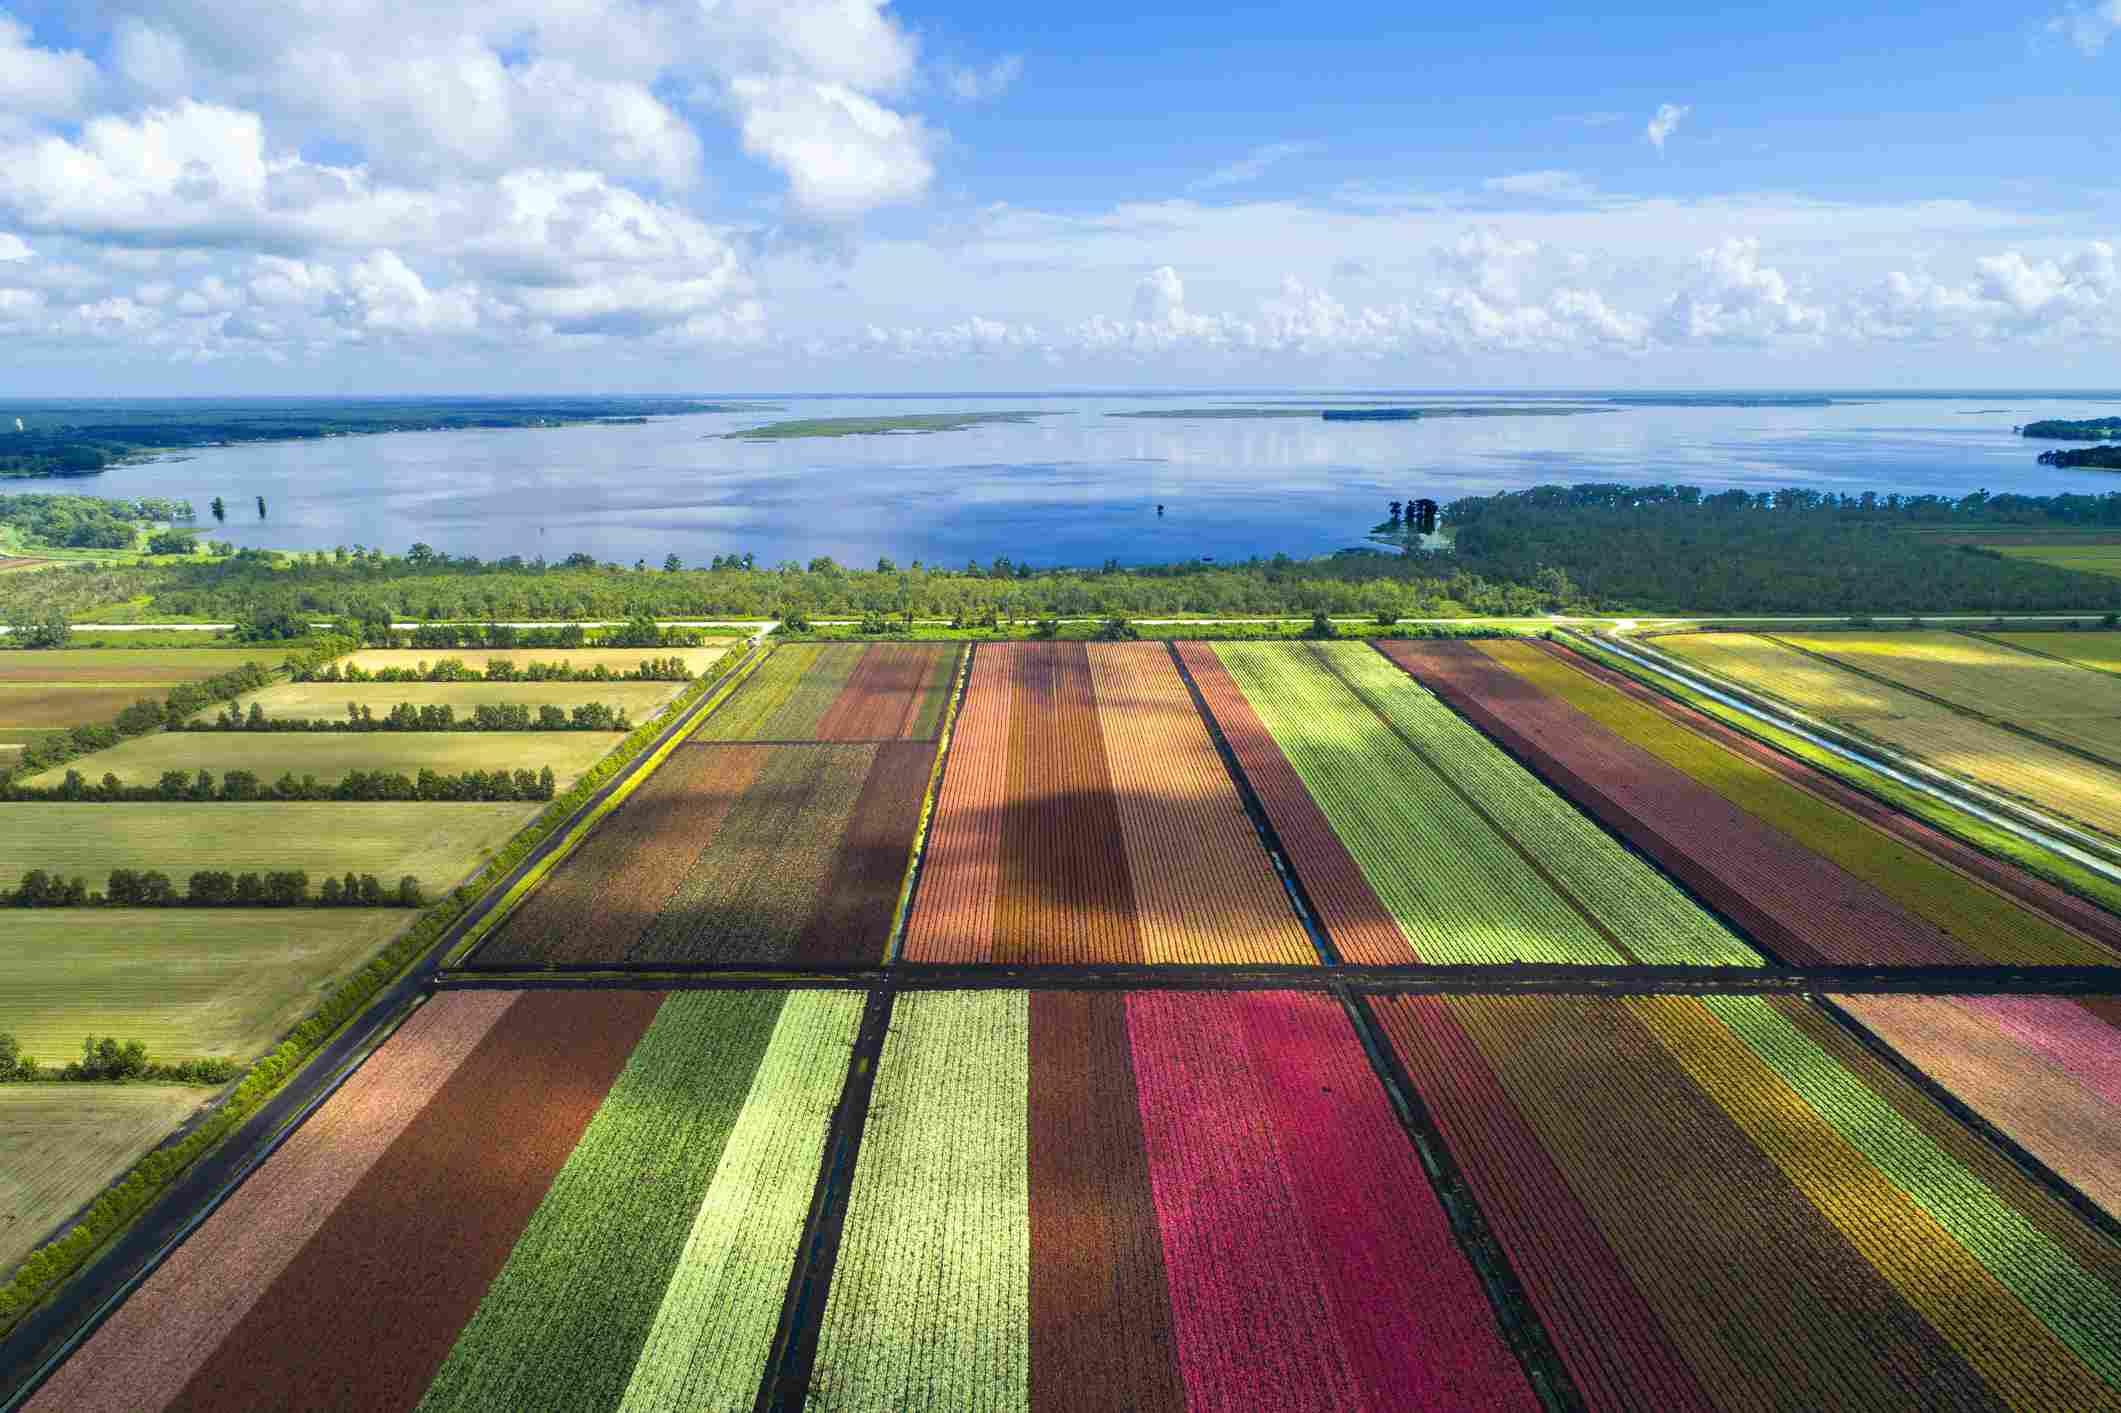 Caladium flower growing fields in Lake Placid Florida